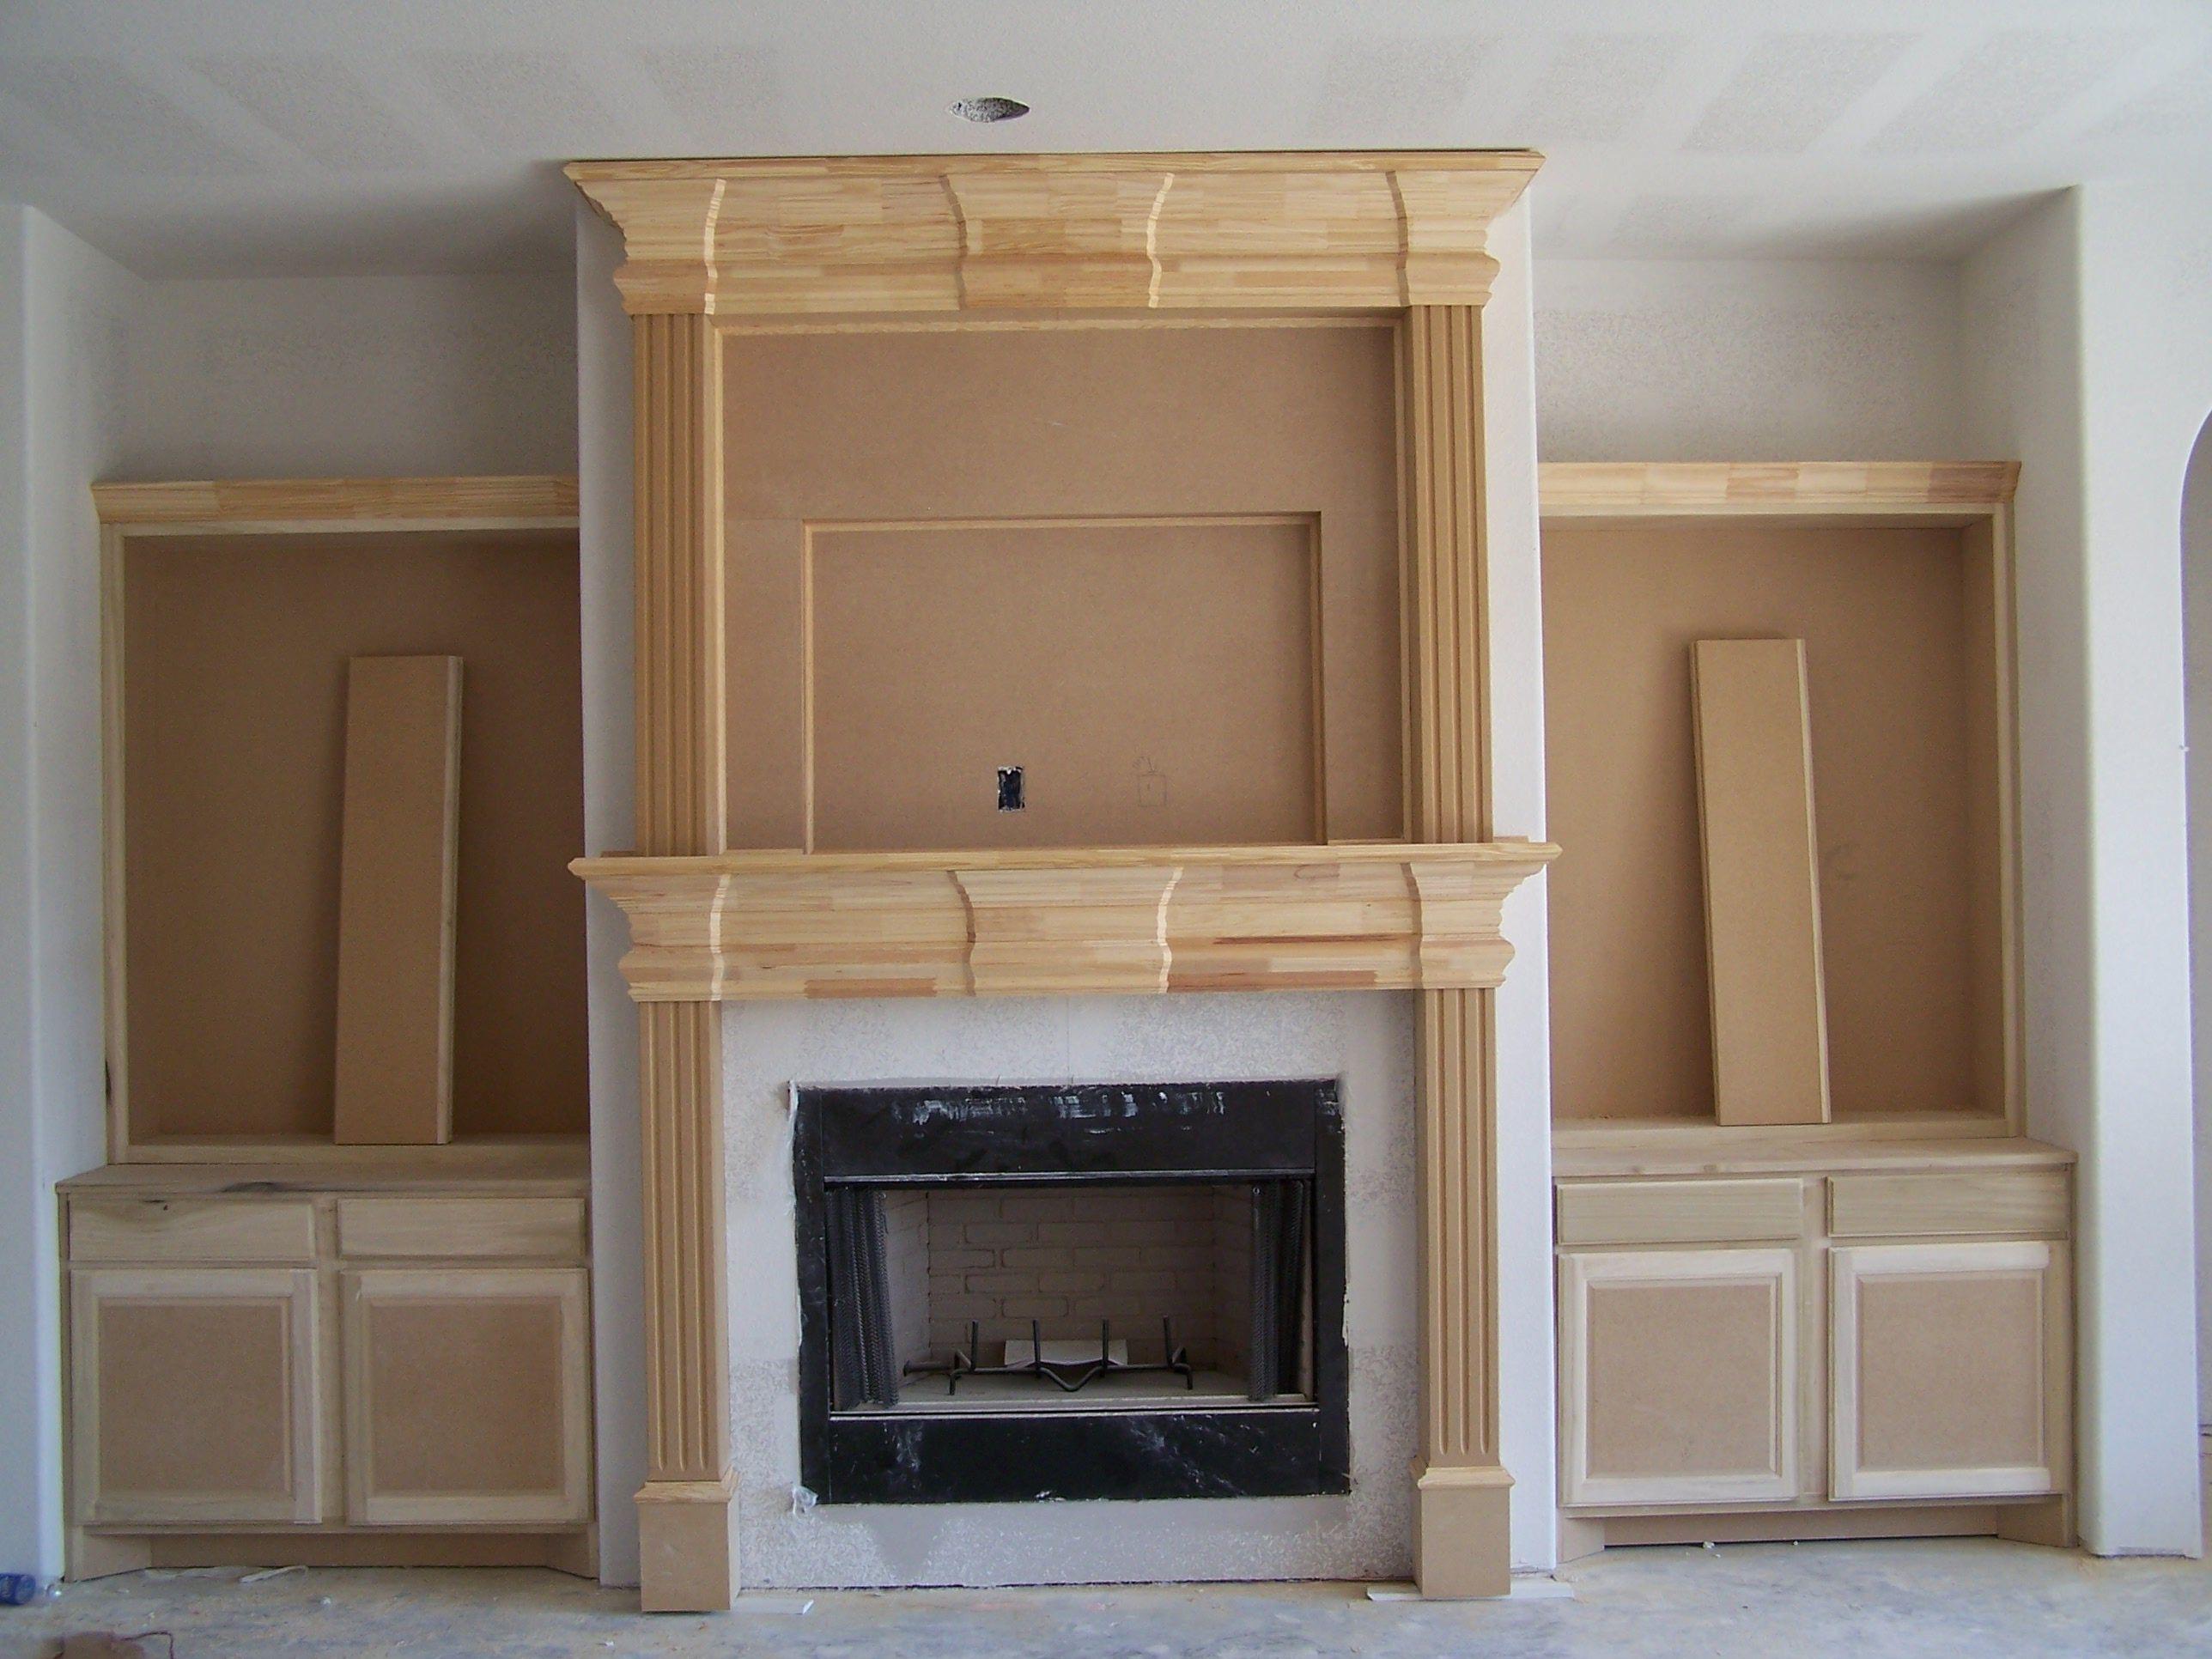 Model 12 Fireplace Mantel Design Fireplace Mantel Surrounds